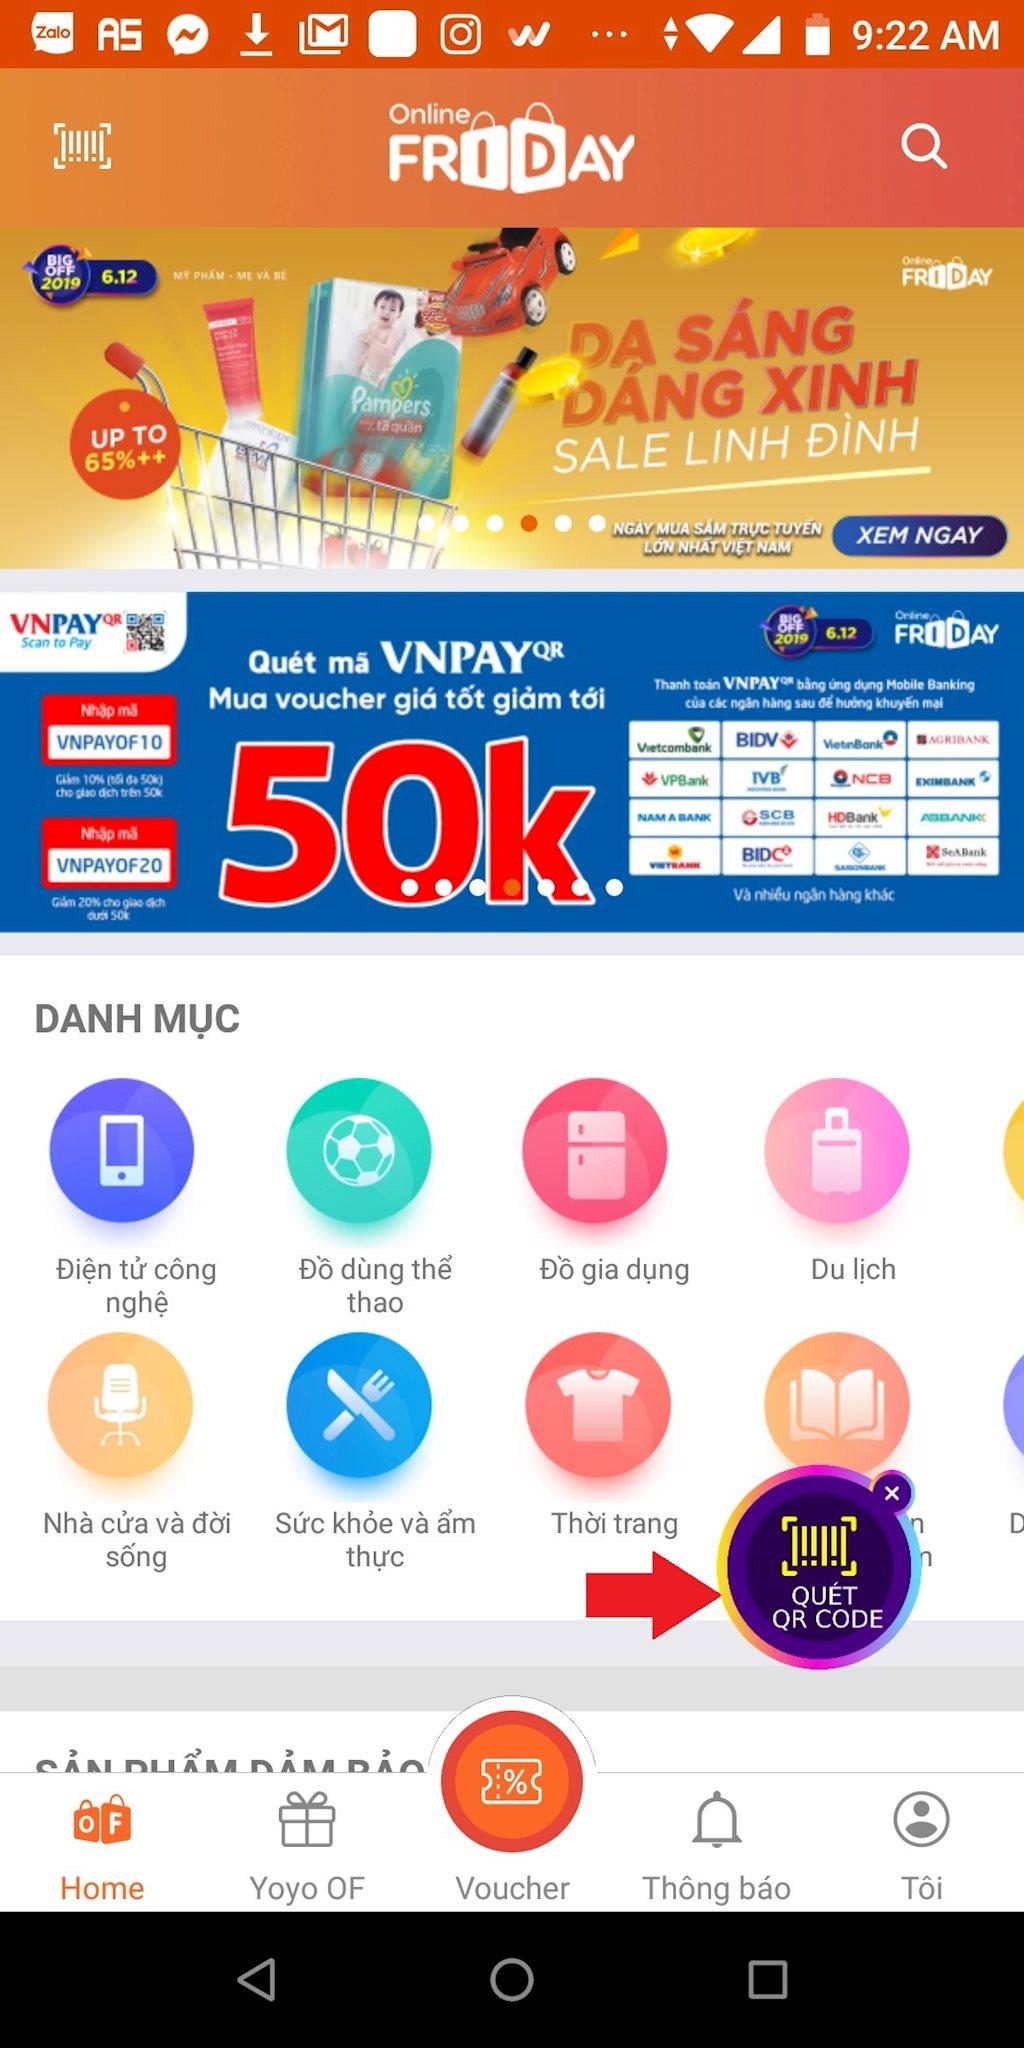 e1-huong-dan-quet-ma-qr-yoyo-online-friday-cach-nhan-qua-online-friday-bang-ma-qr-screenshot_20191205-092225.jpg